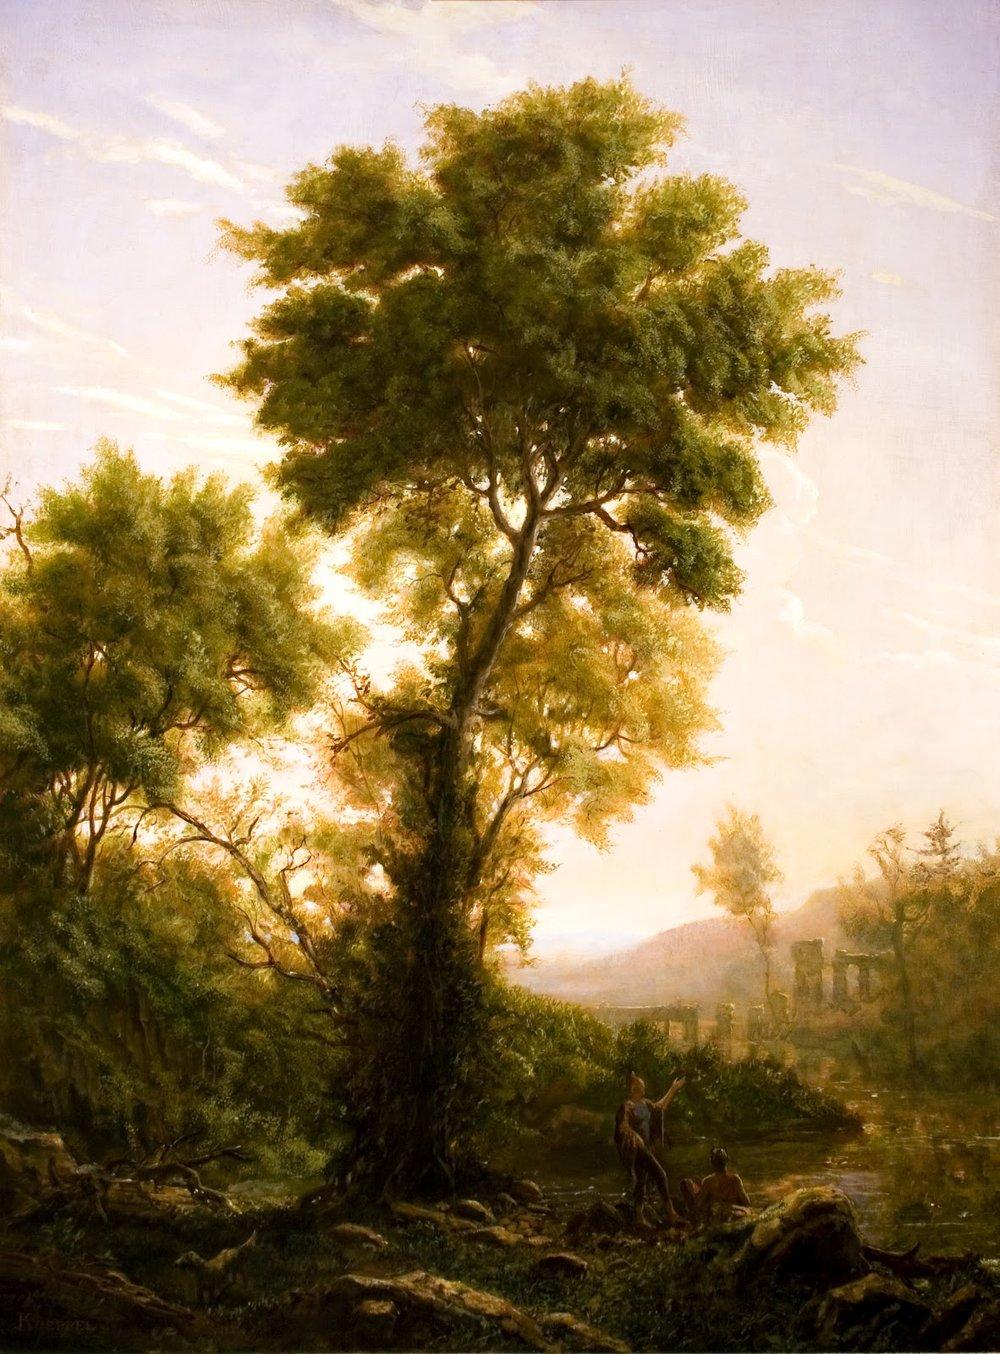 Koeppel_The Claudian Tree_24x32_oil on panel.jpg